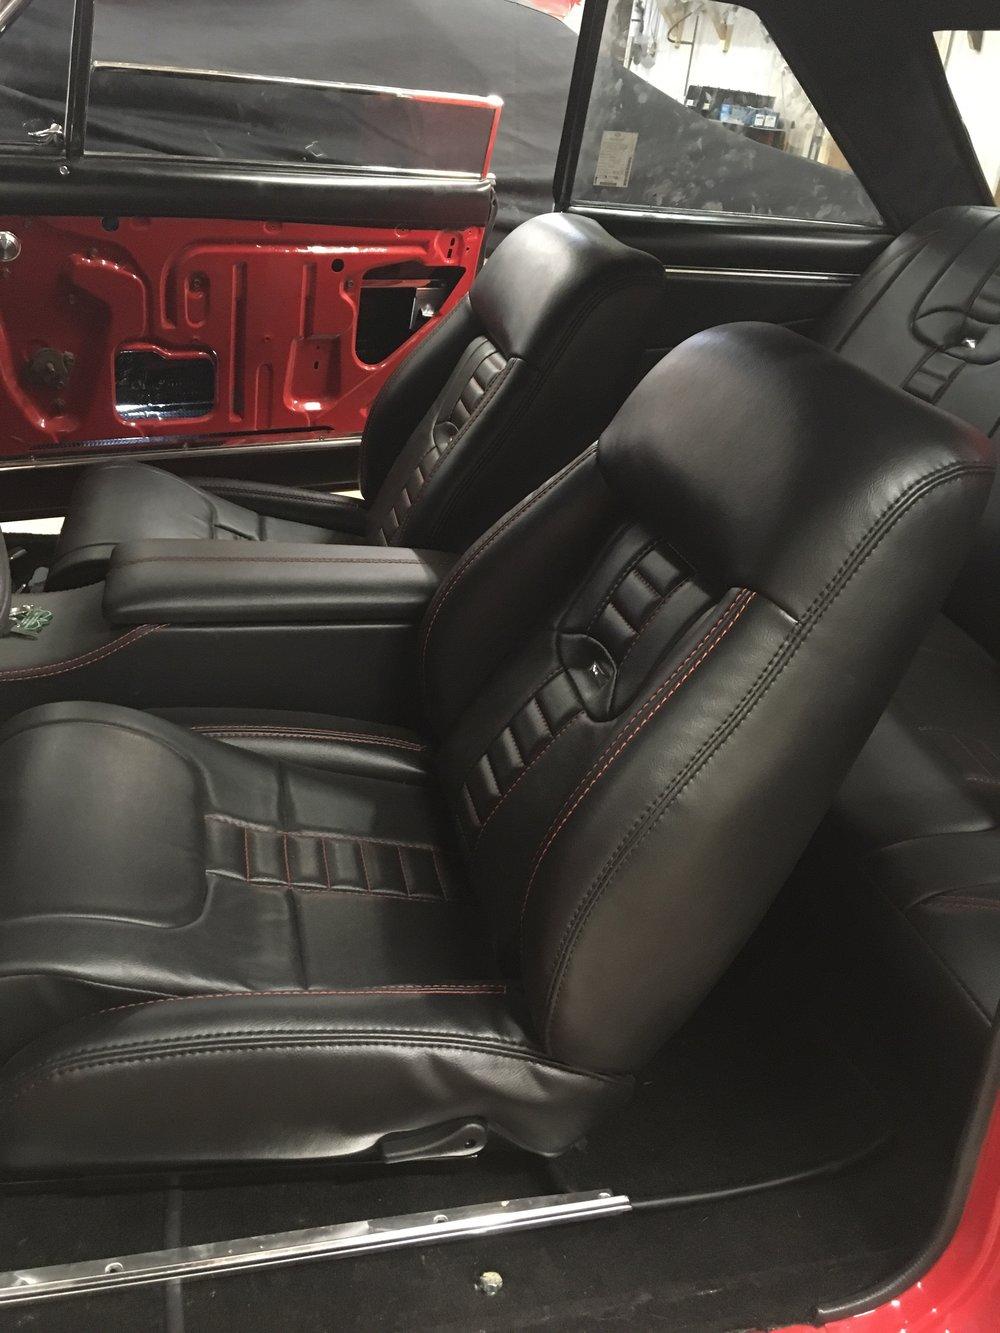 minneapolis-hot-rod-restoration-65-nova-new-leather-interior-hot-rod-factory.jpg